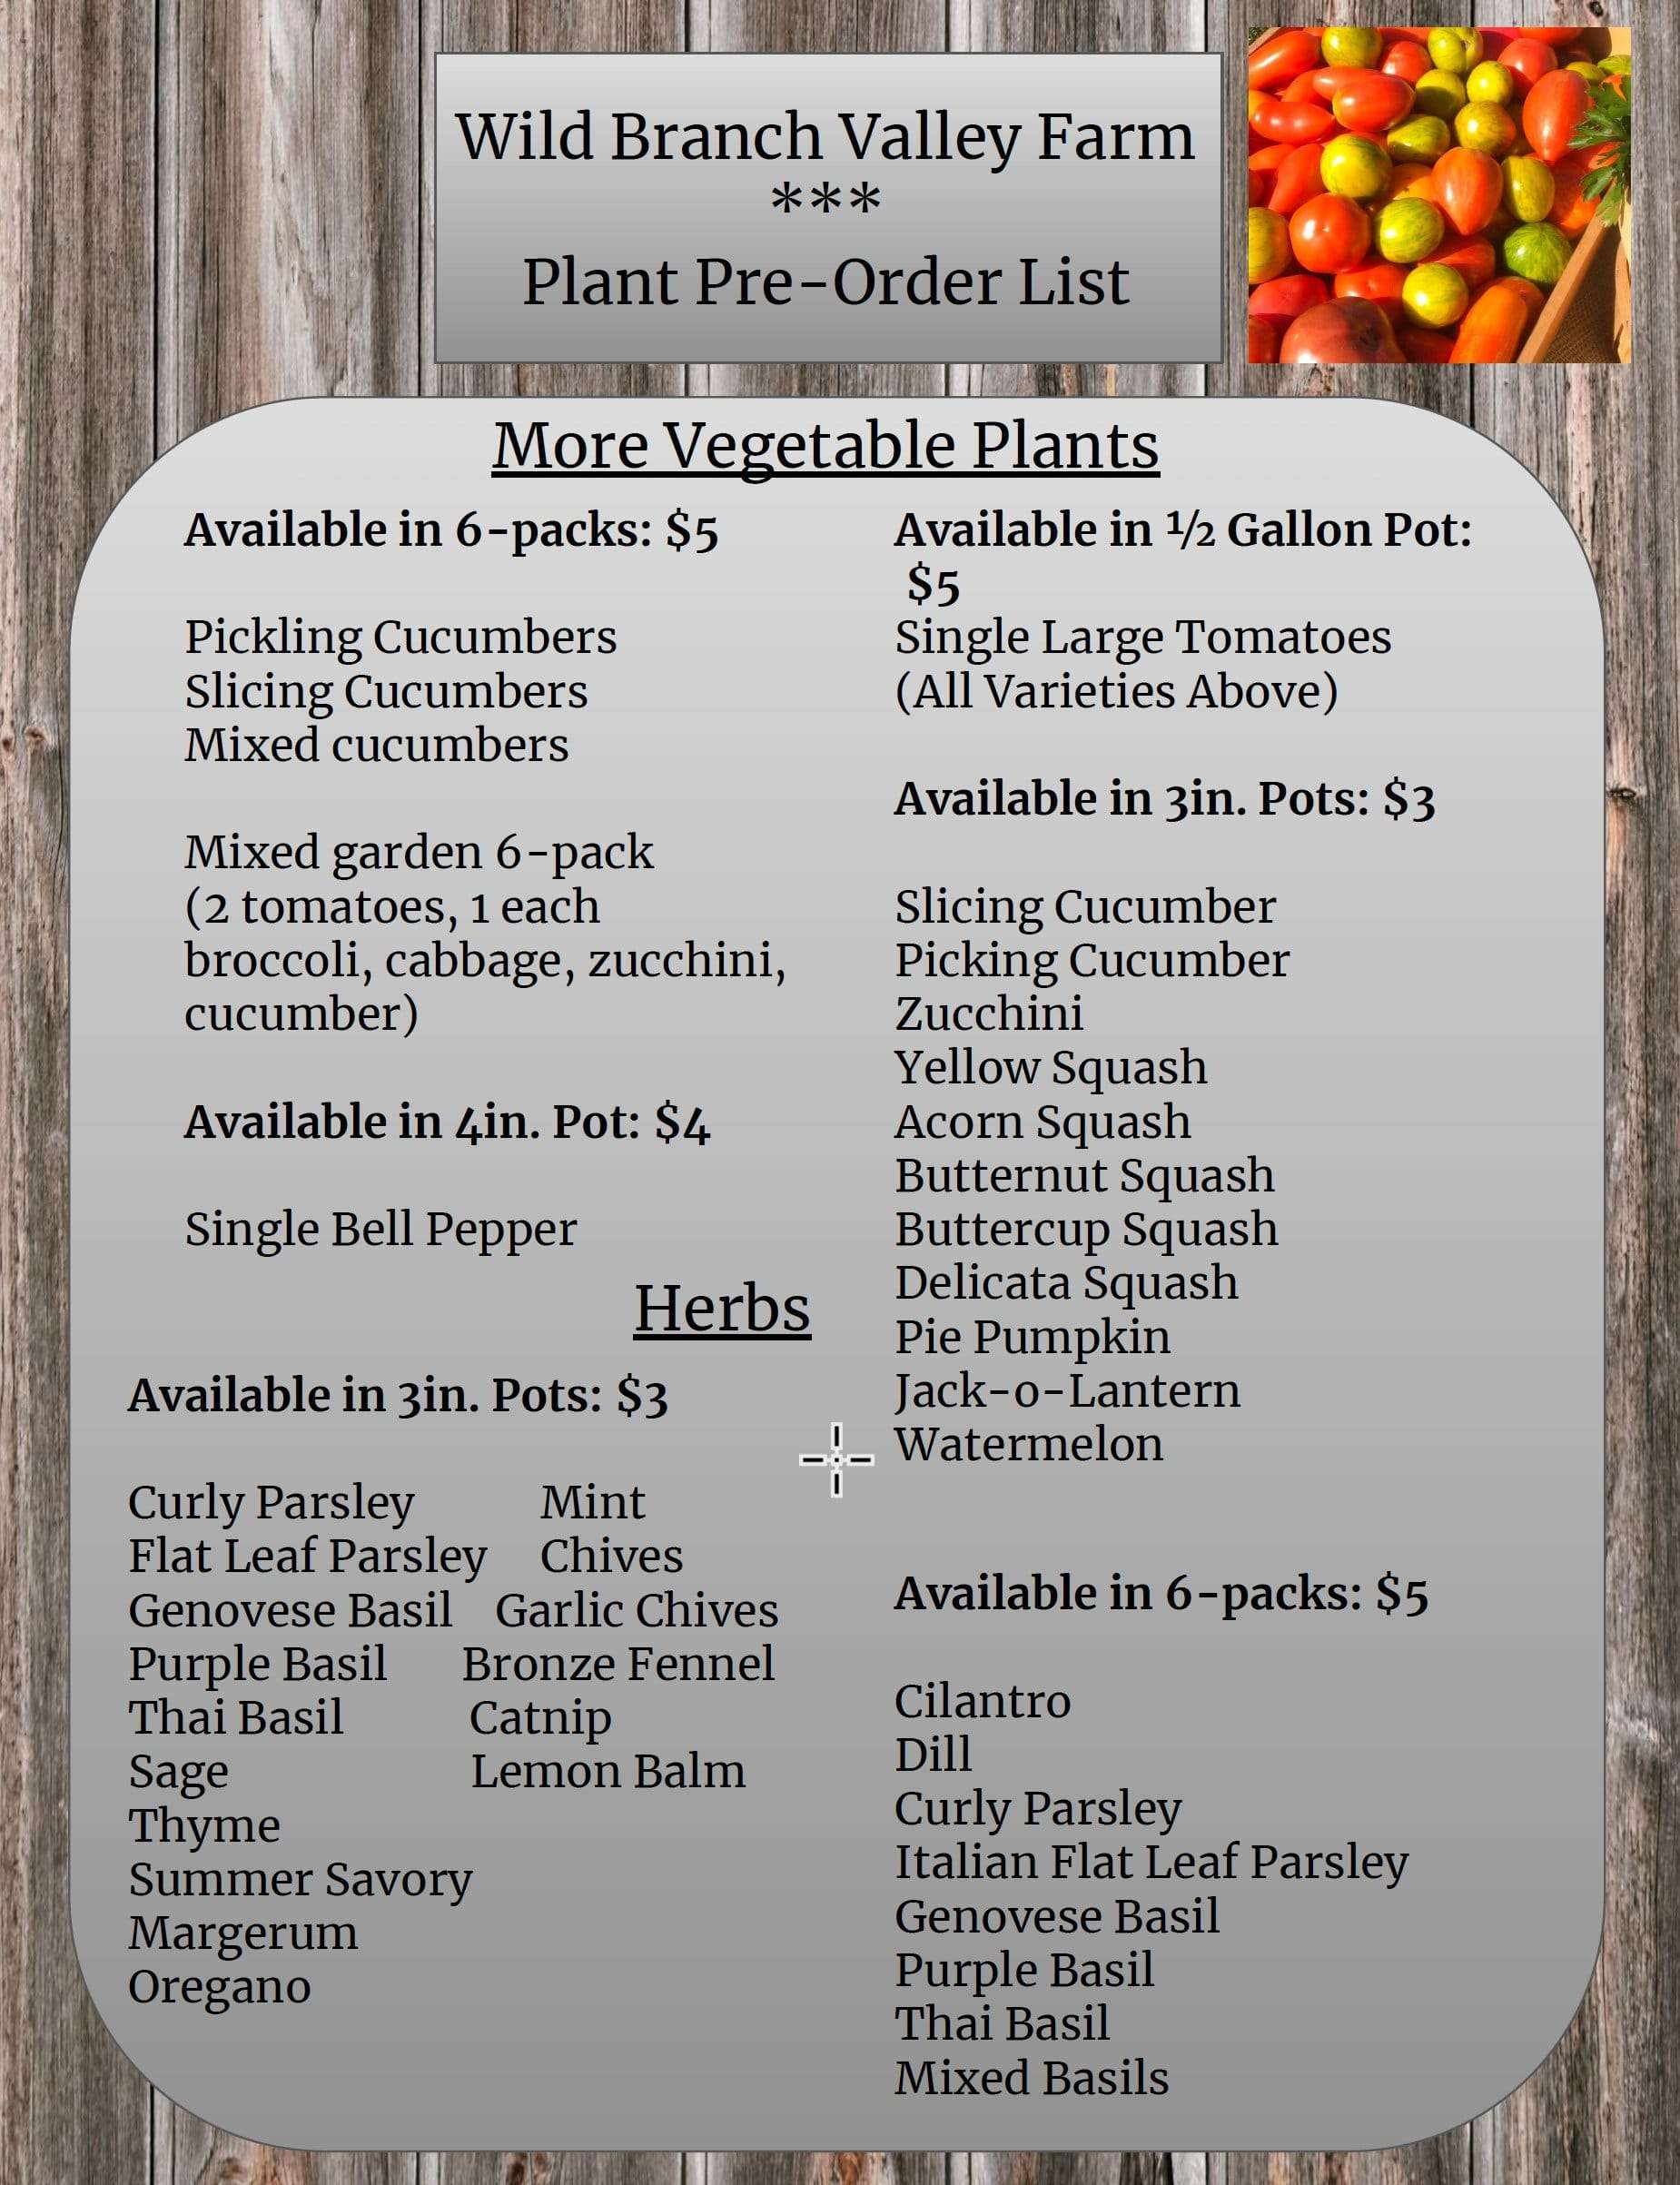 Flowers, Vegetables, Mushrooms, Herbs - Wild Branch Valley Farm - Craftsbury Vermont